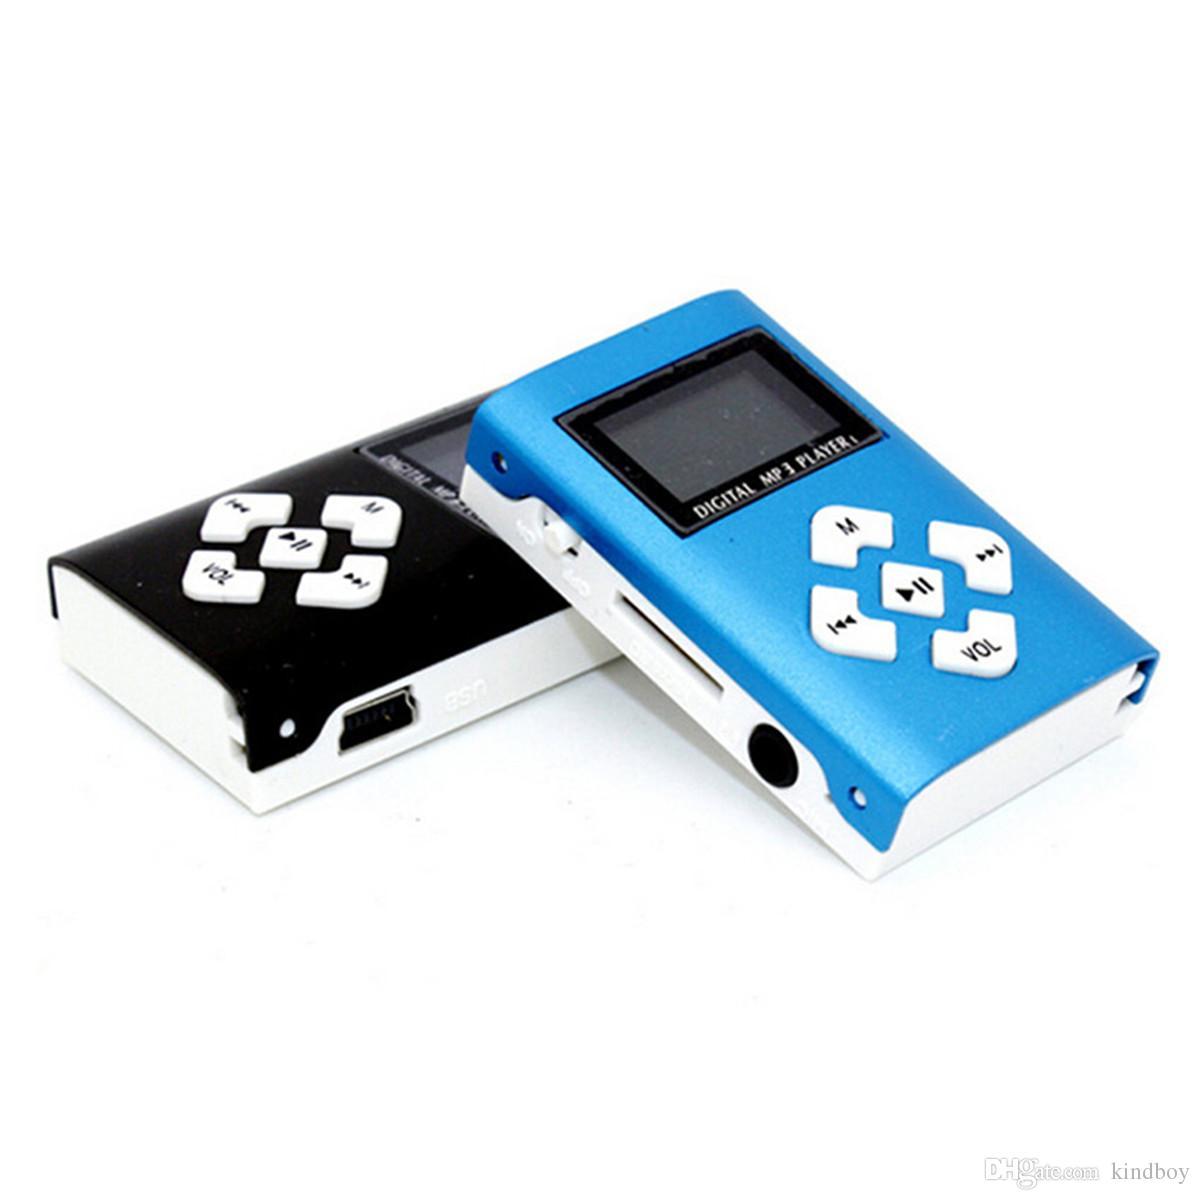 Hot marking Mini USB Clip MP3 Player LCD Screen Support 32GB Micro SD TF Card Digital Mp3 players